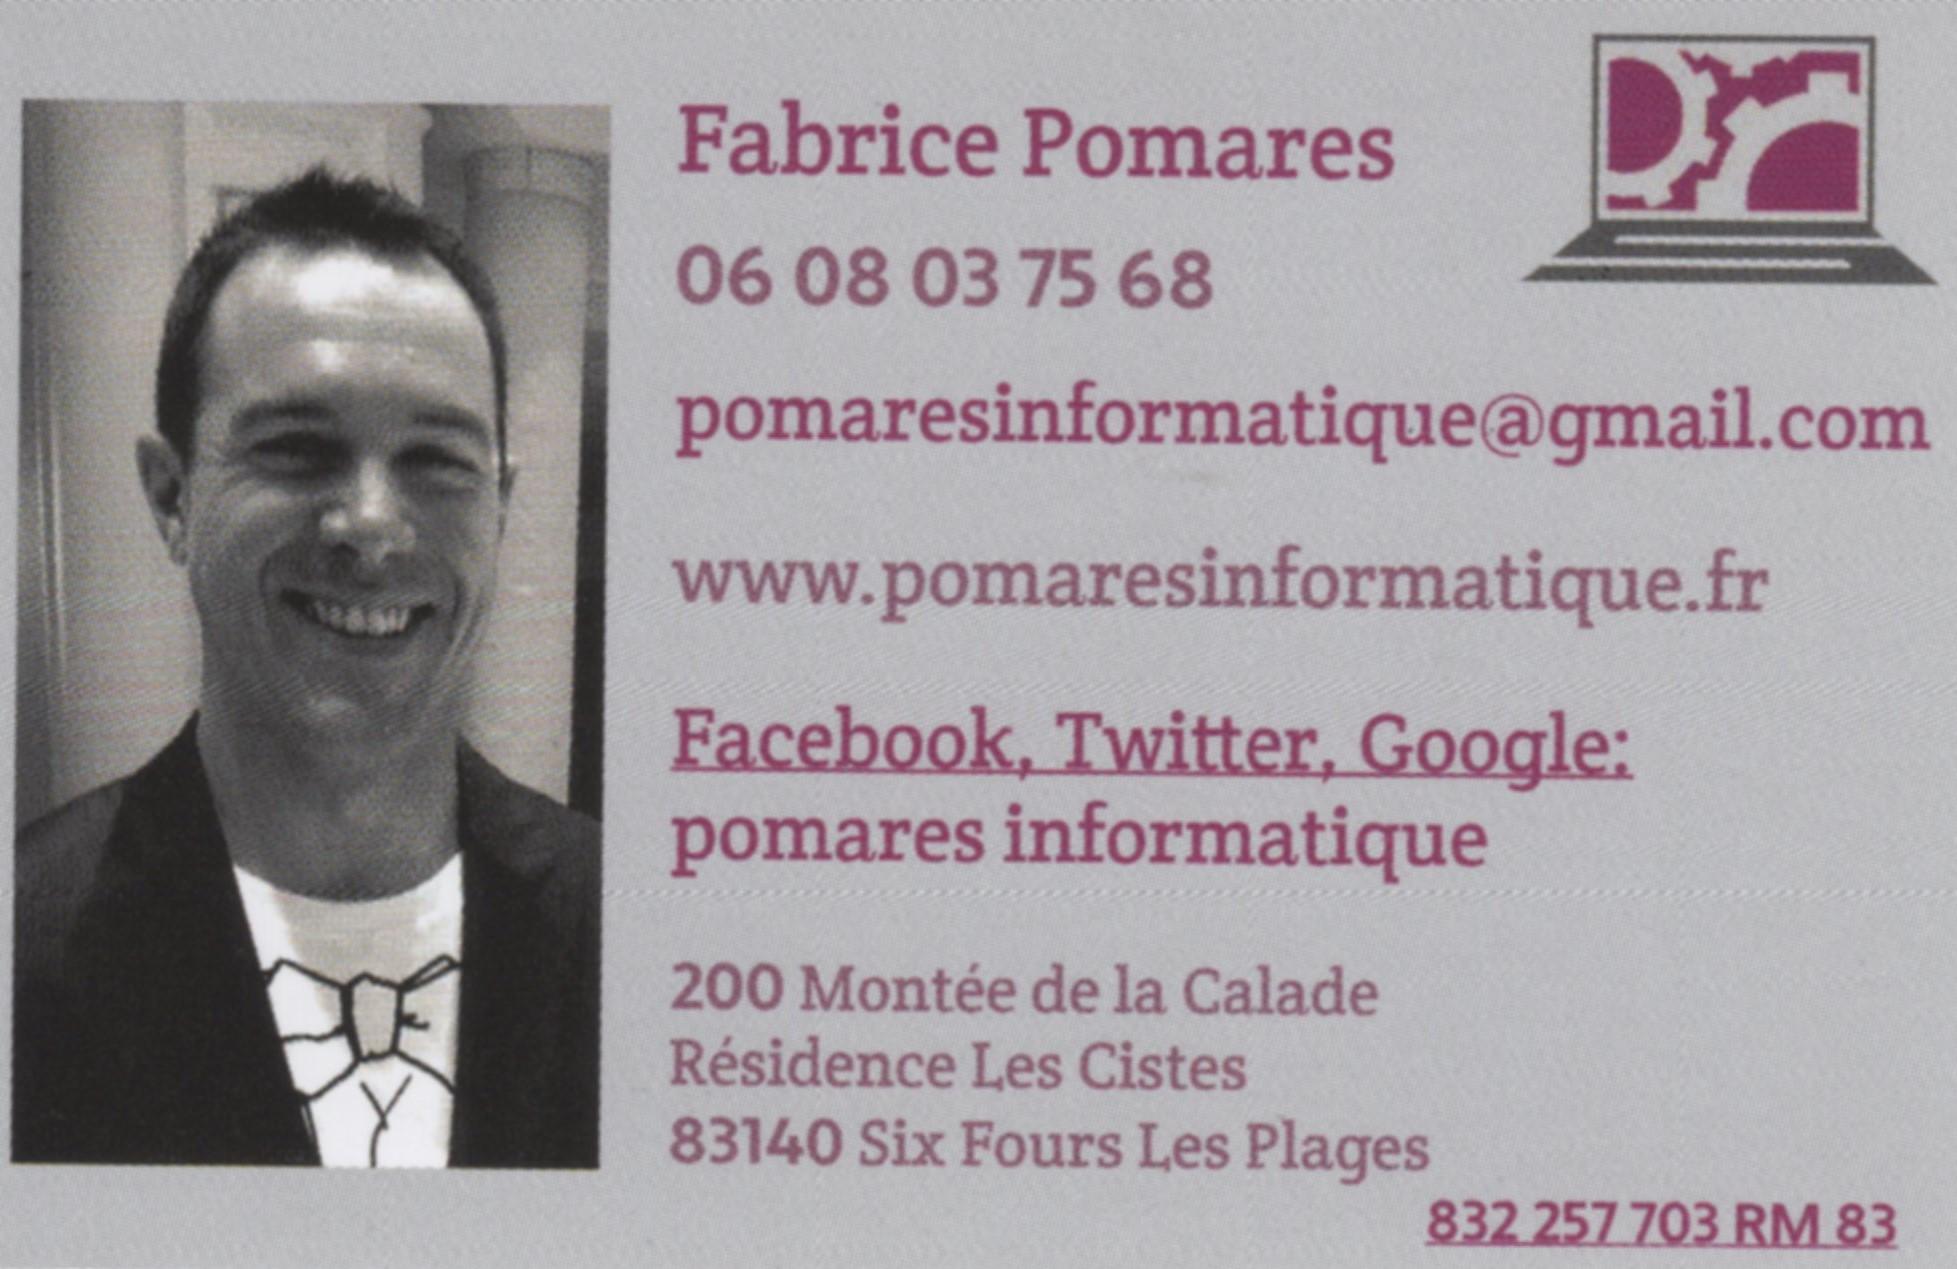 Pomares Fabrice